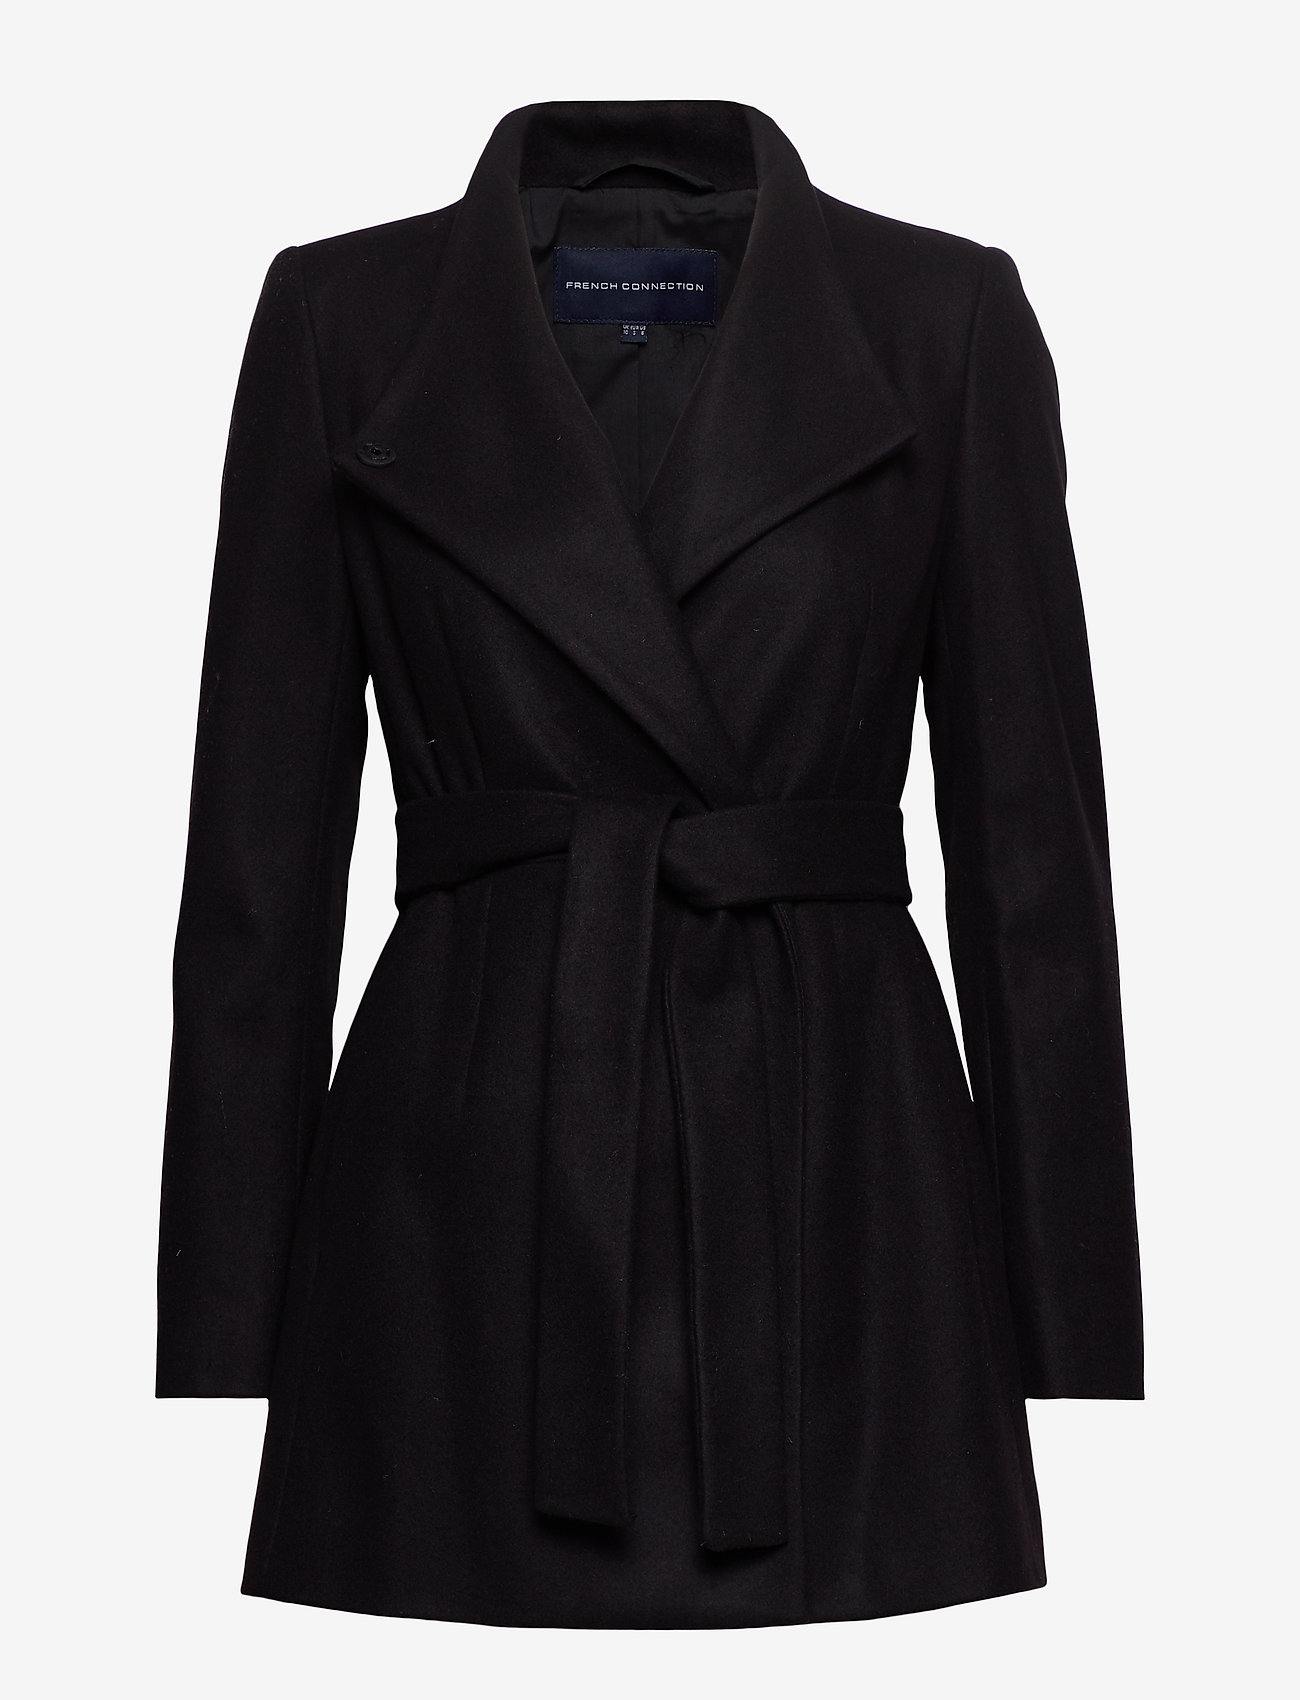 French Connection - FT PLATFORM FELT CROSSOVER COAT - wool jackets - black - 0